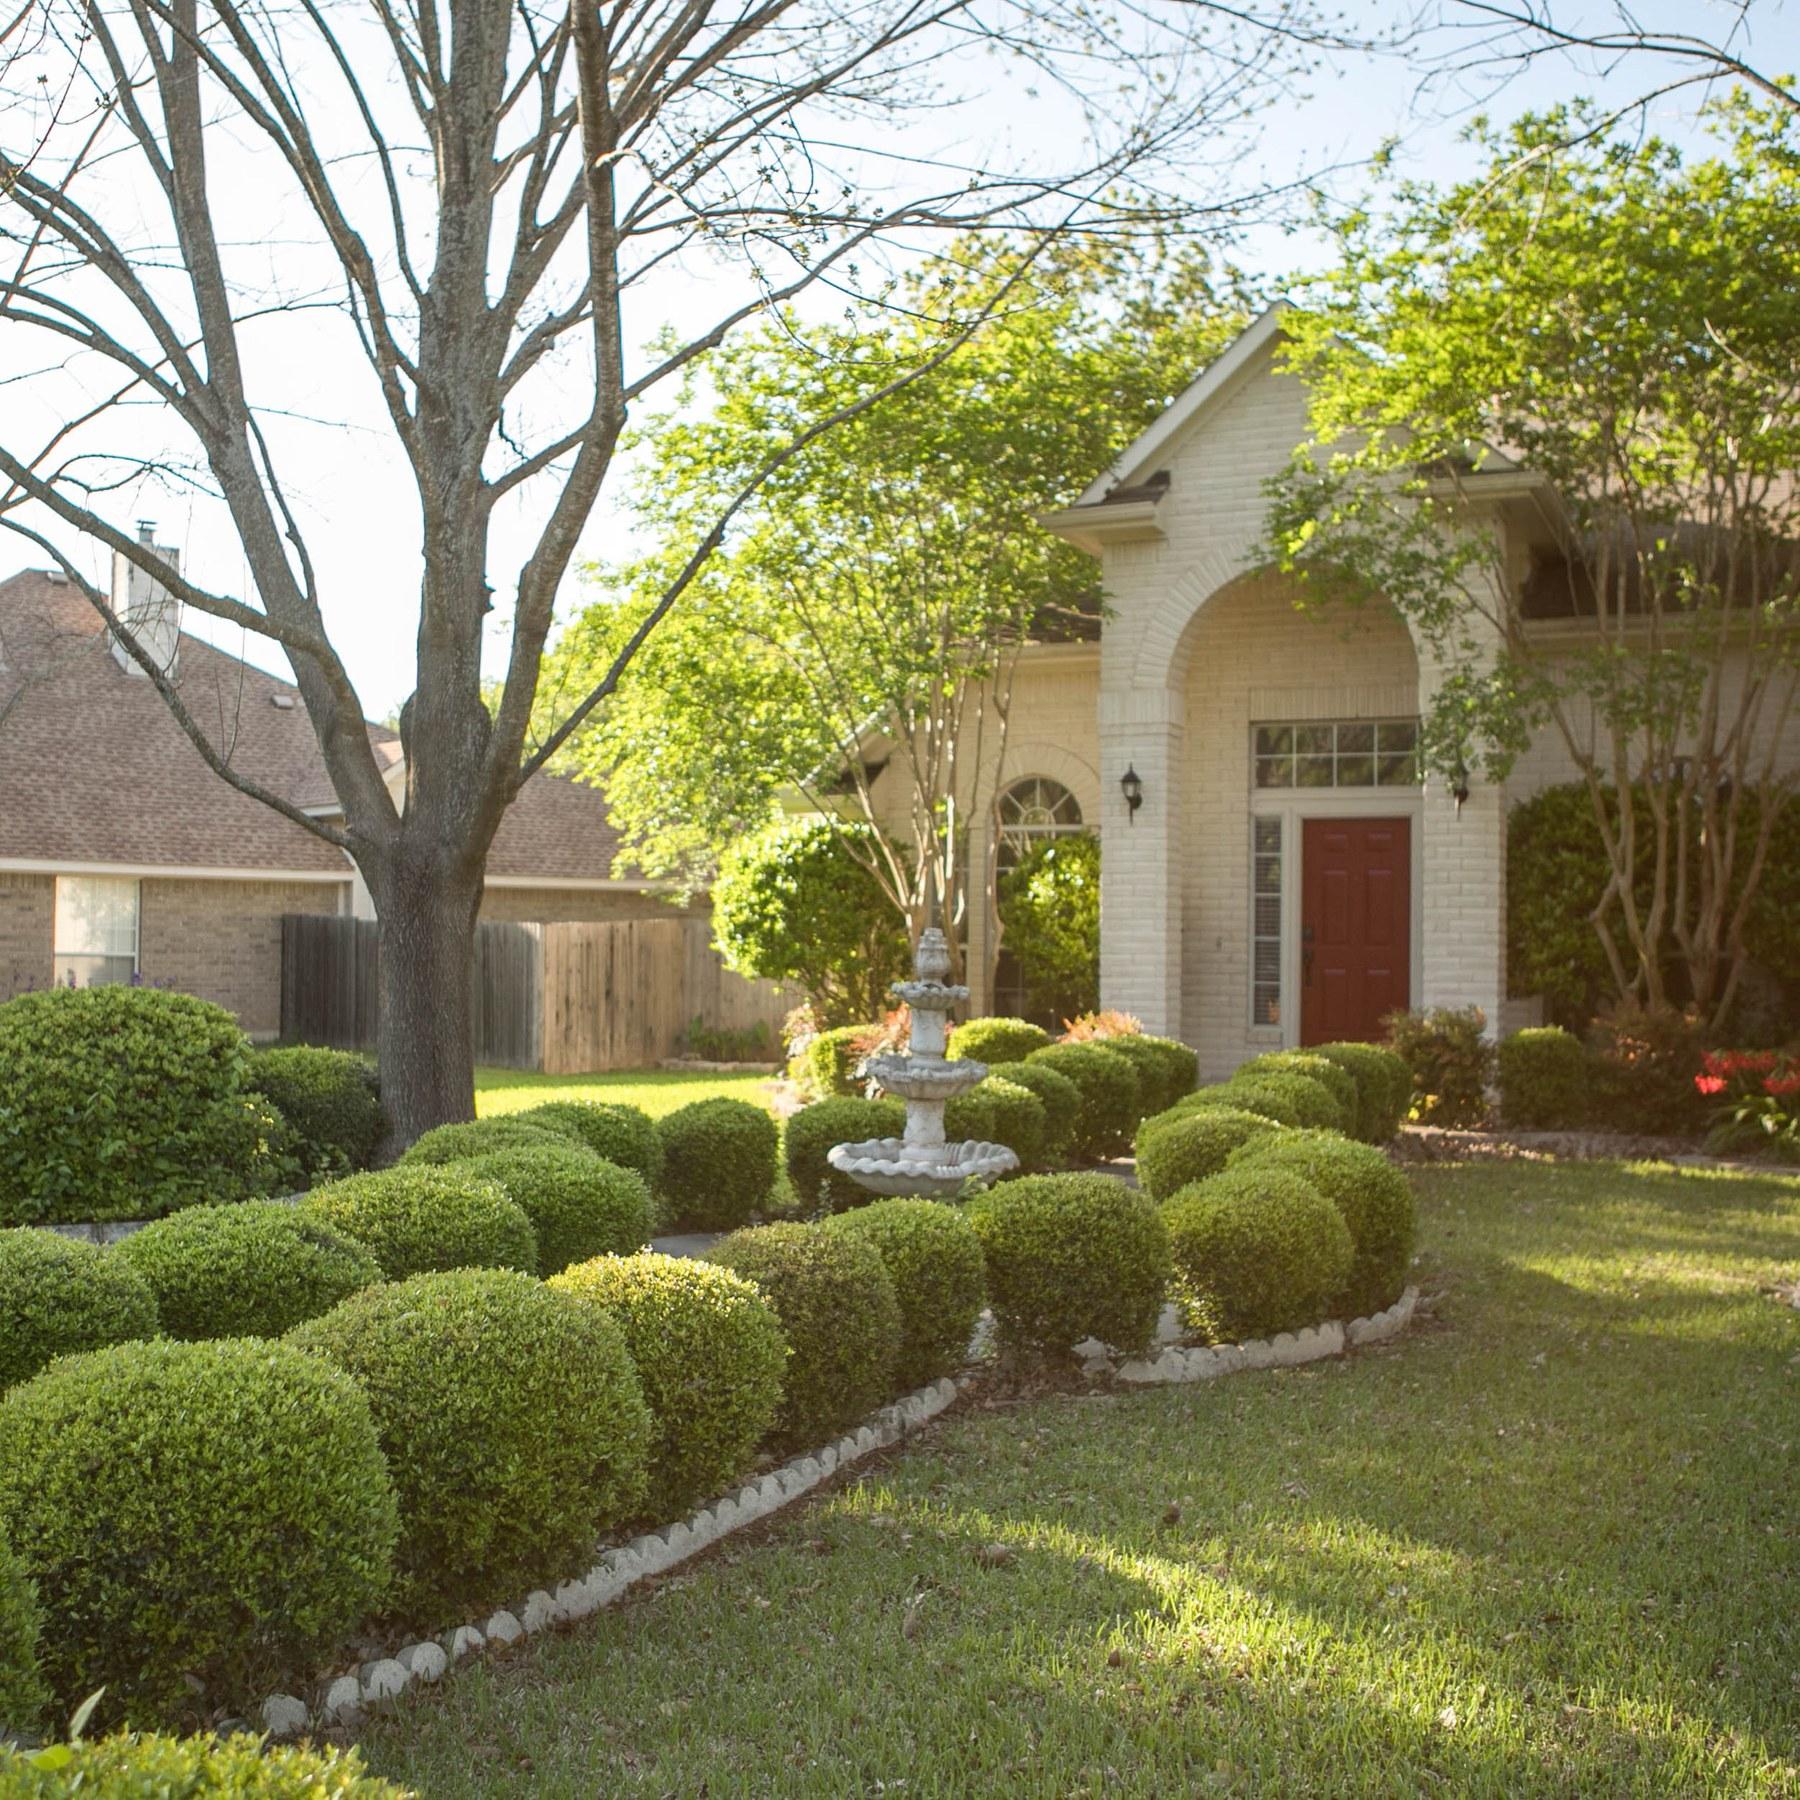 Vs Hunting Ridge Apartments: Settlers Ridge, Pflugerville TX - Neighborhood Guide